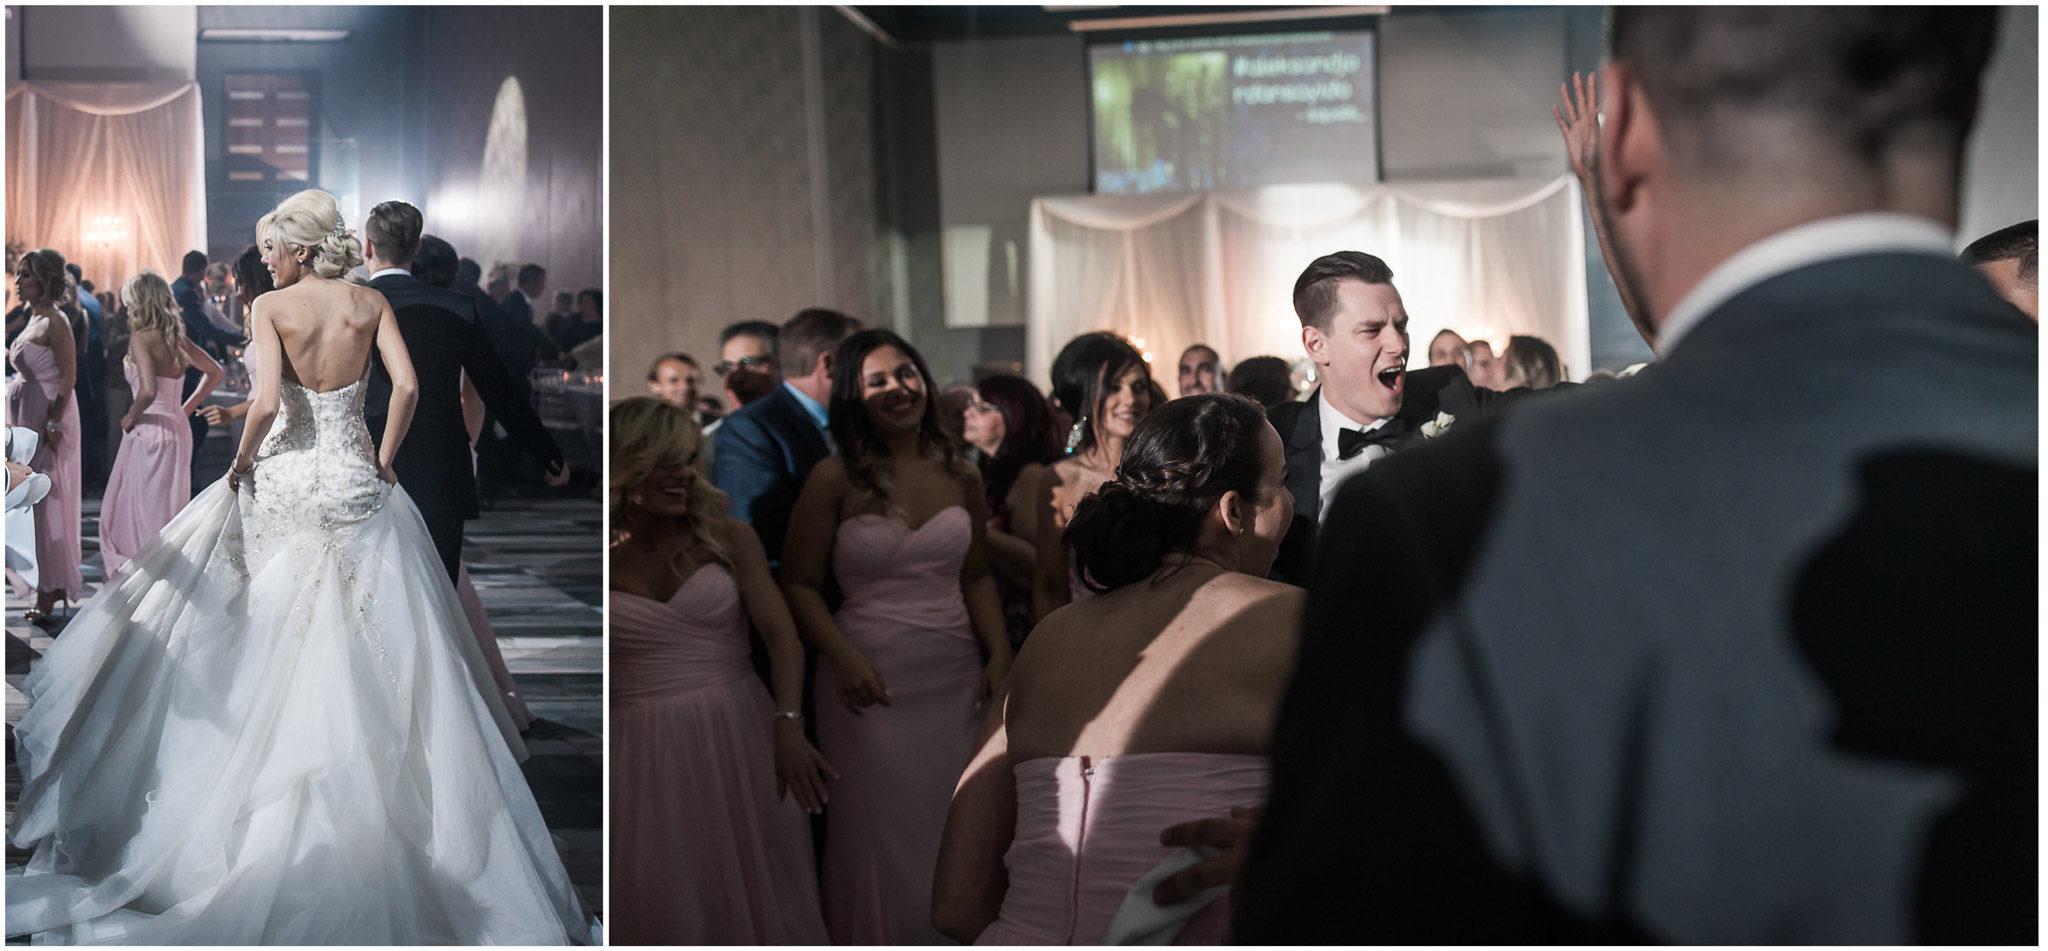 wedding-reception-universal-event-space-7